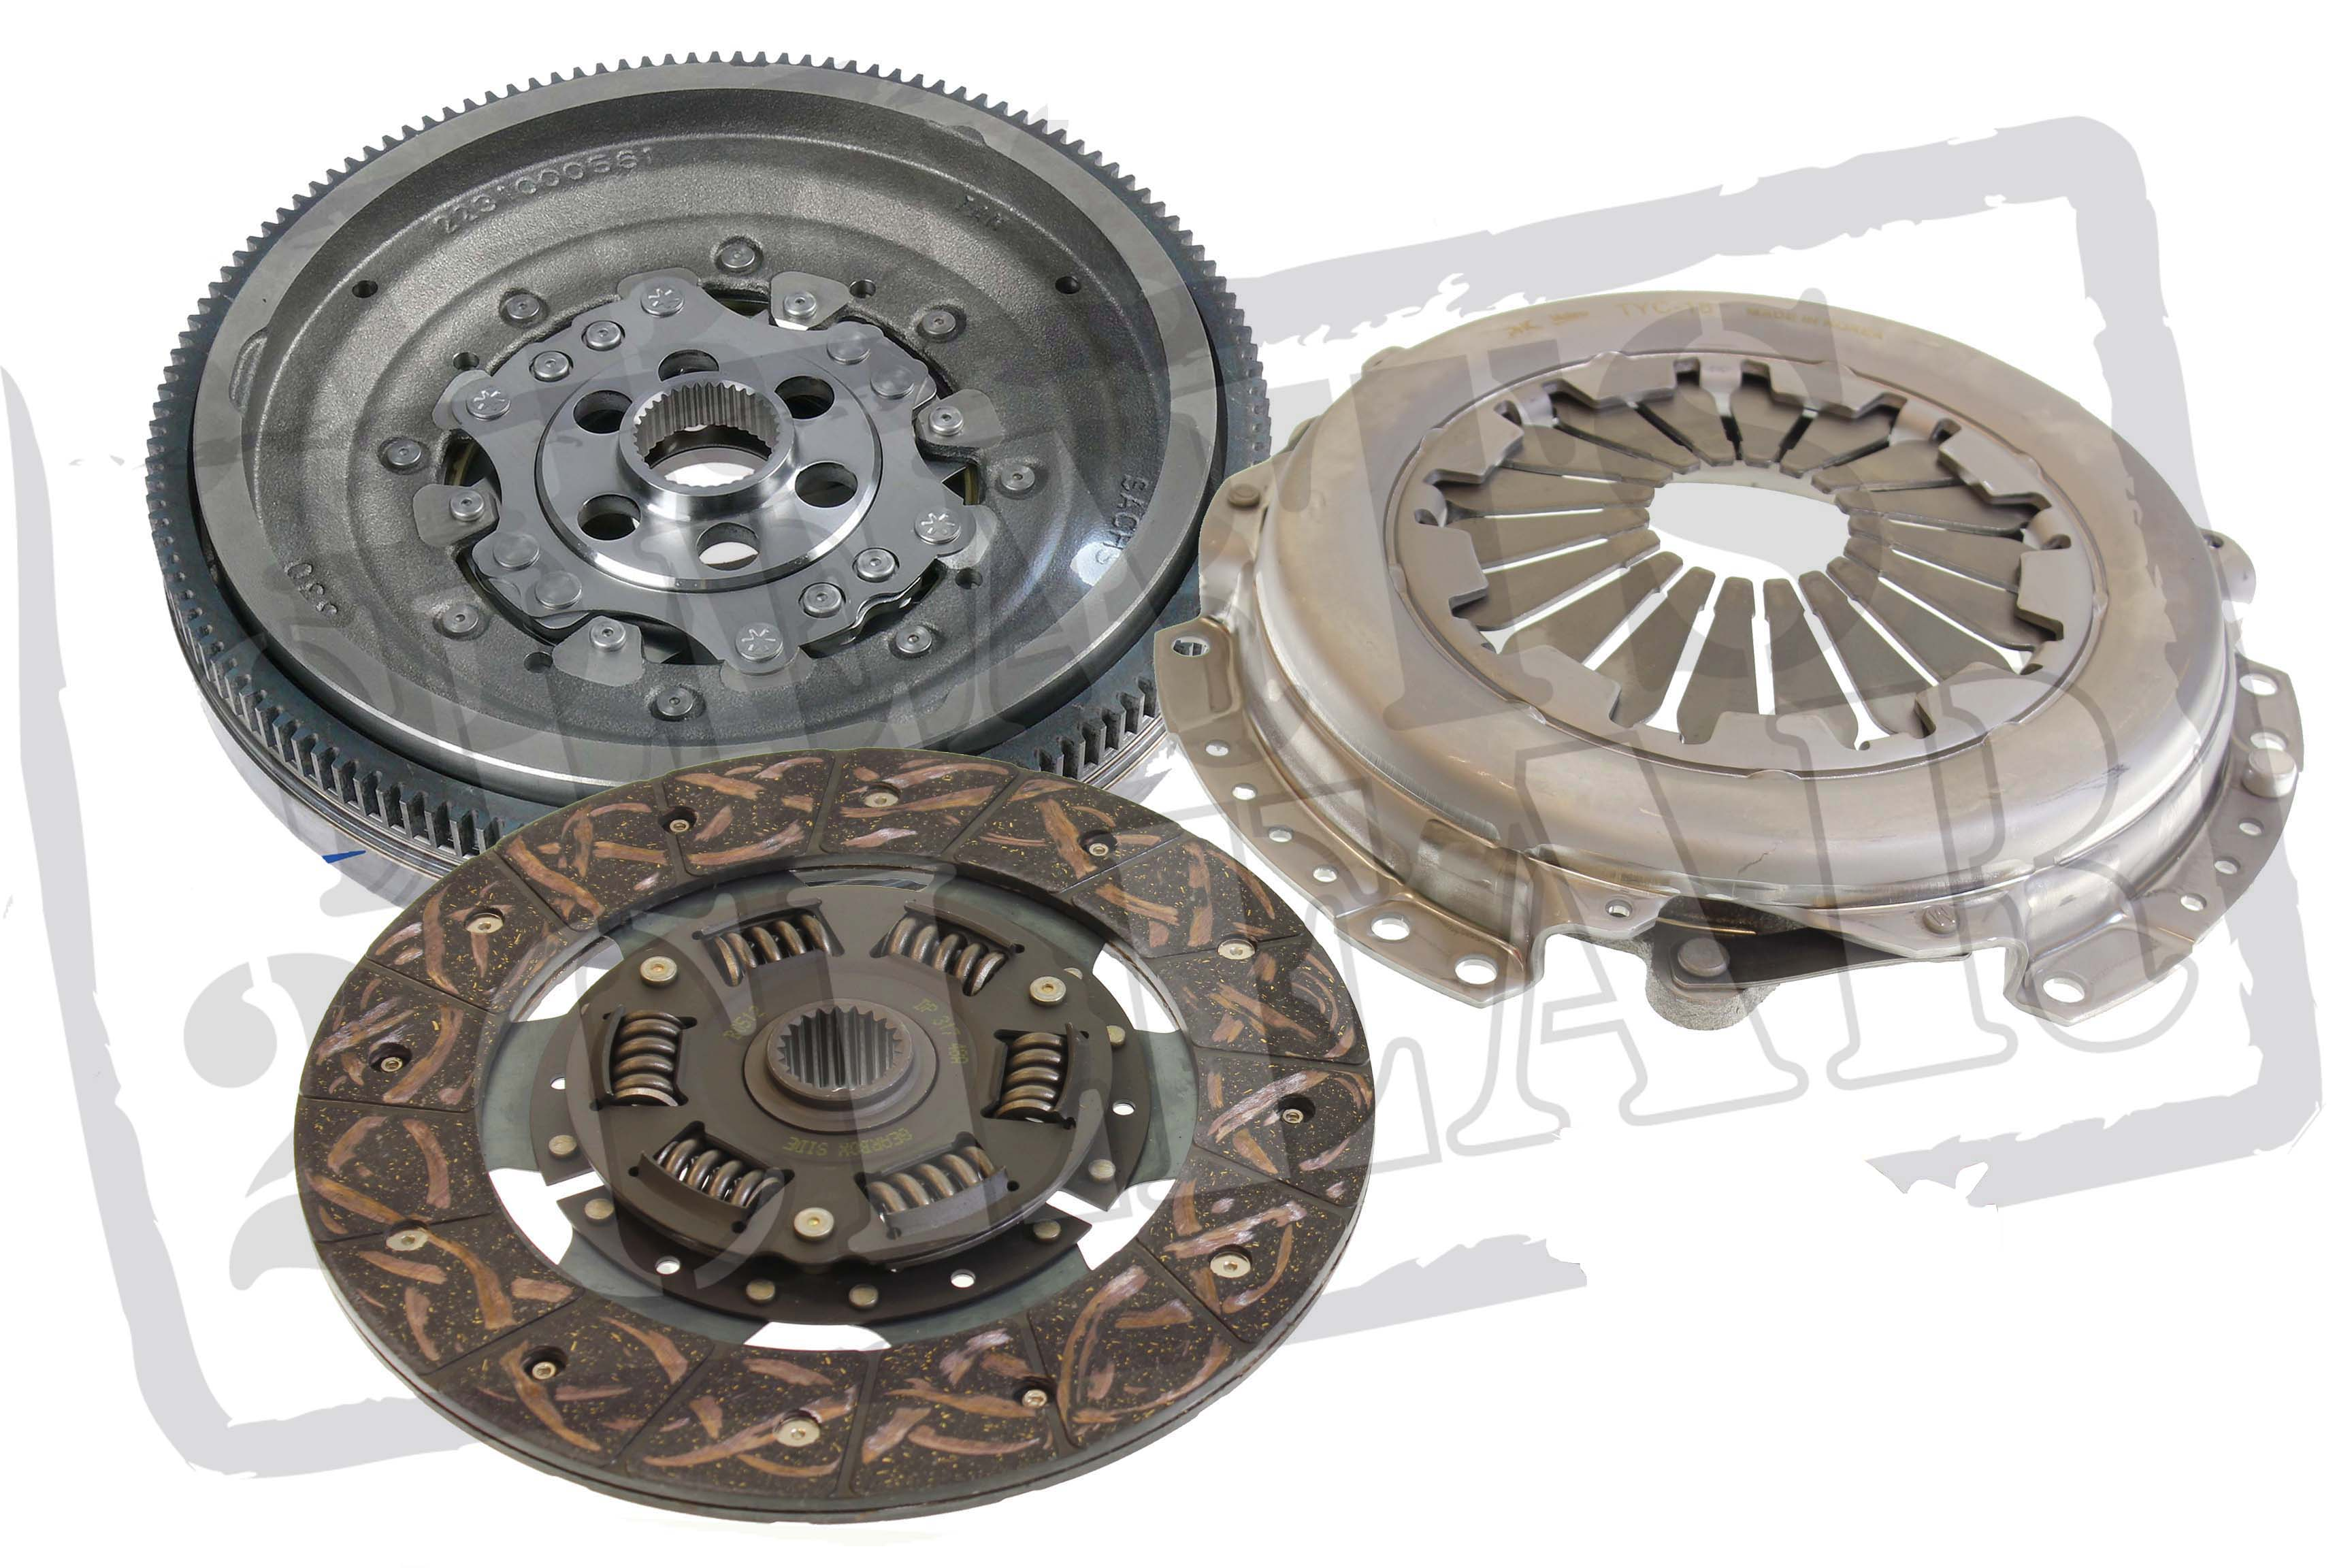 Semi Clutch Kits : Citroen c grand picasso hdi dual mass flywheel clutch